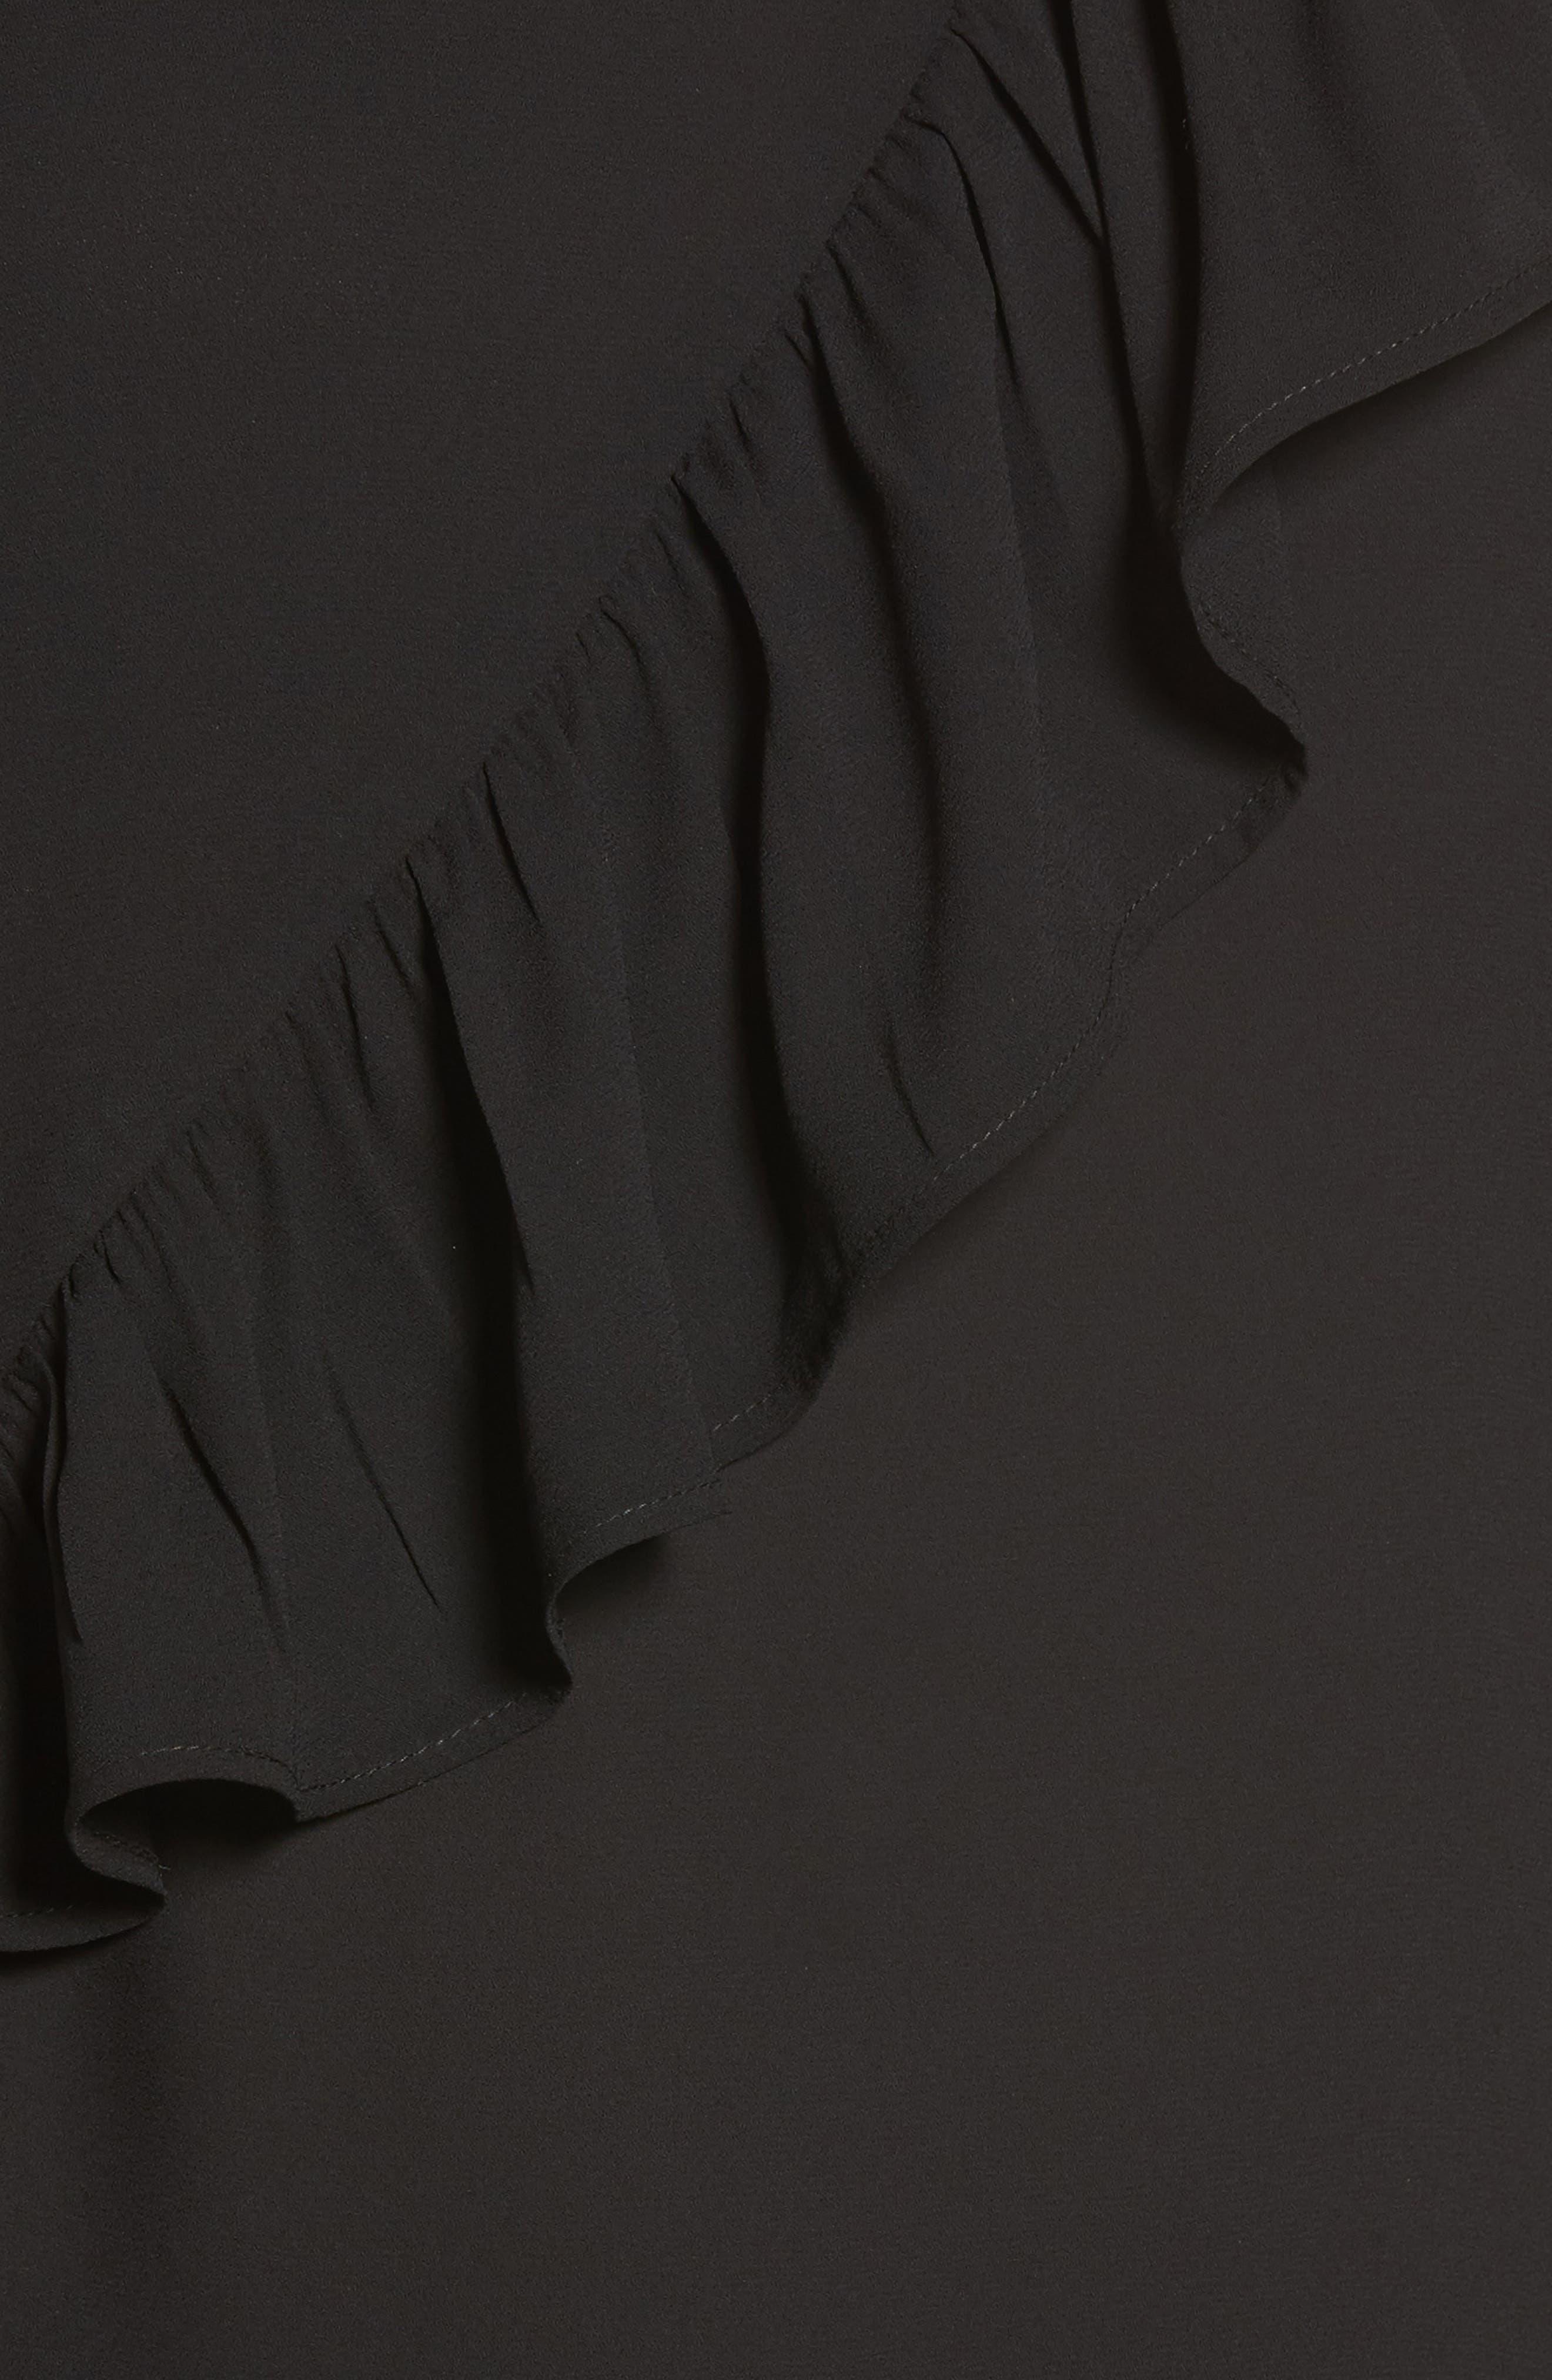 Ruffle Detail Top,                             Alternate thumbnail 5, color,                             001